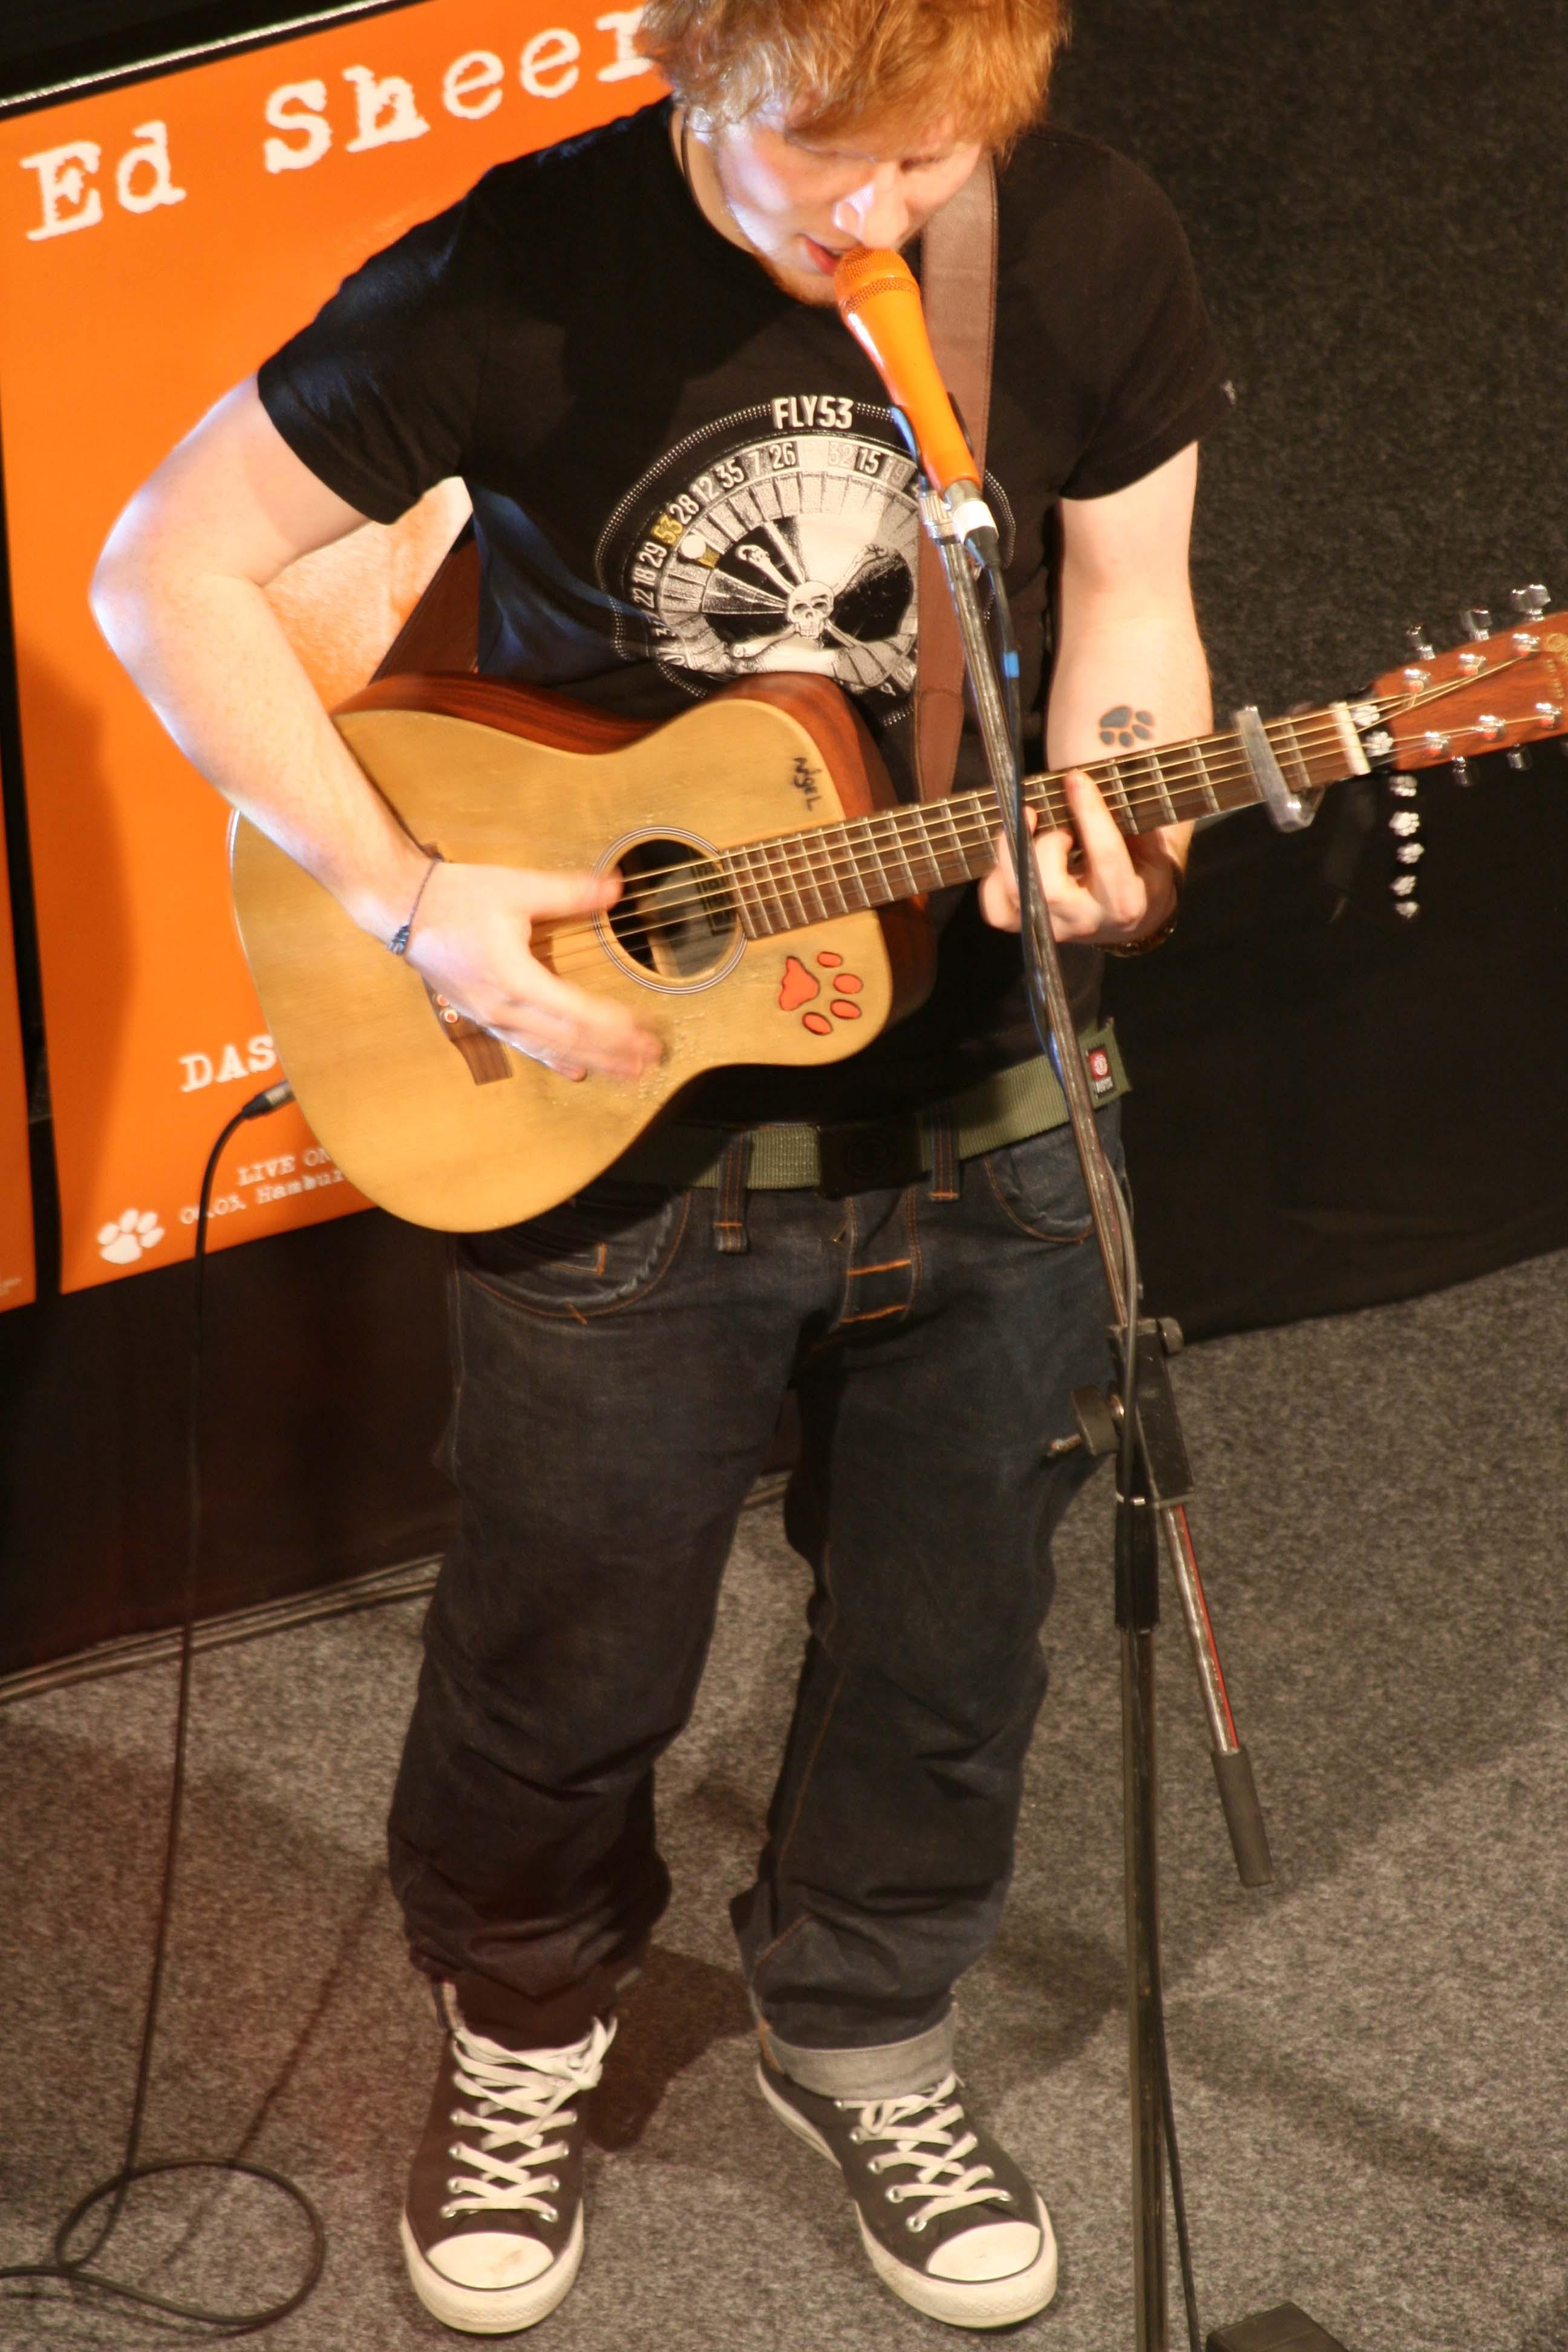 Ed Sheeran live performance at Alexa Berlin with guitar